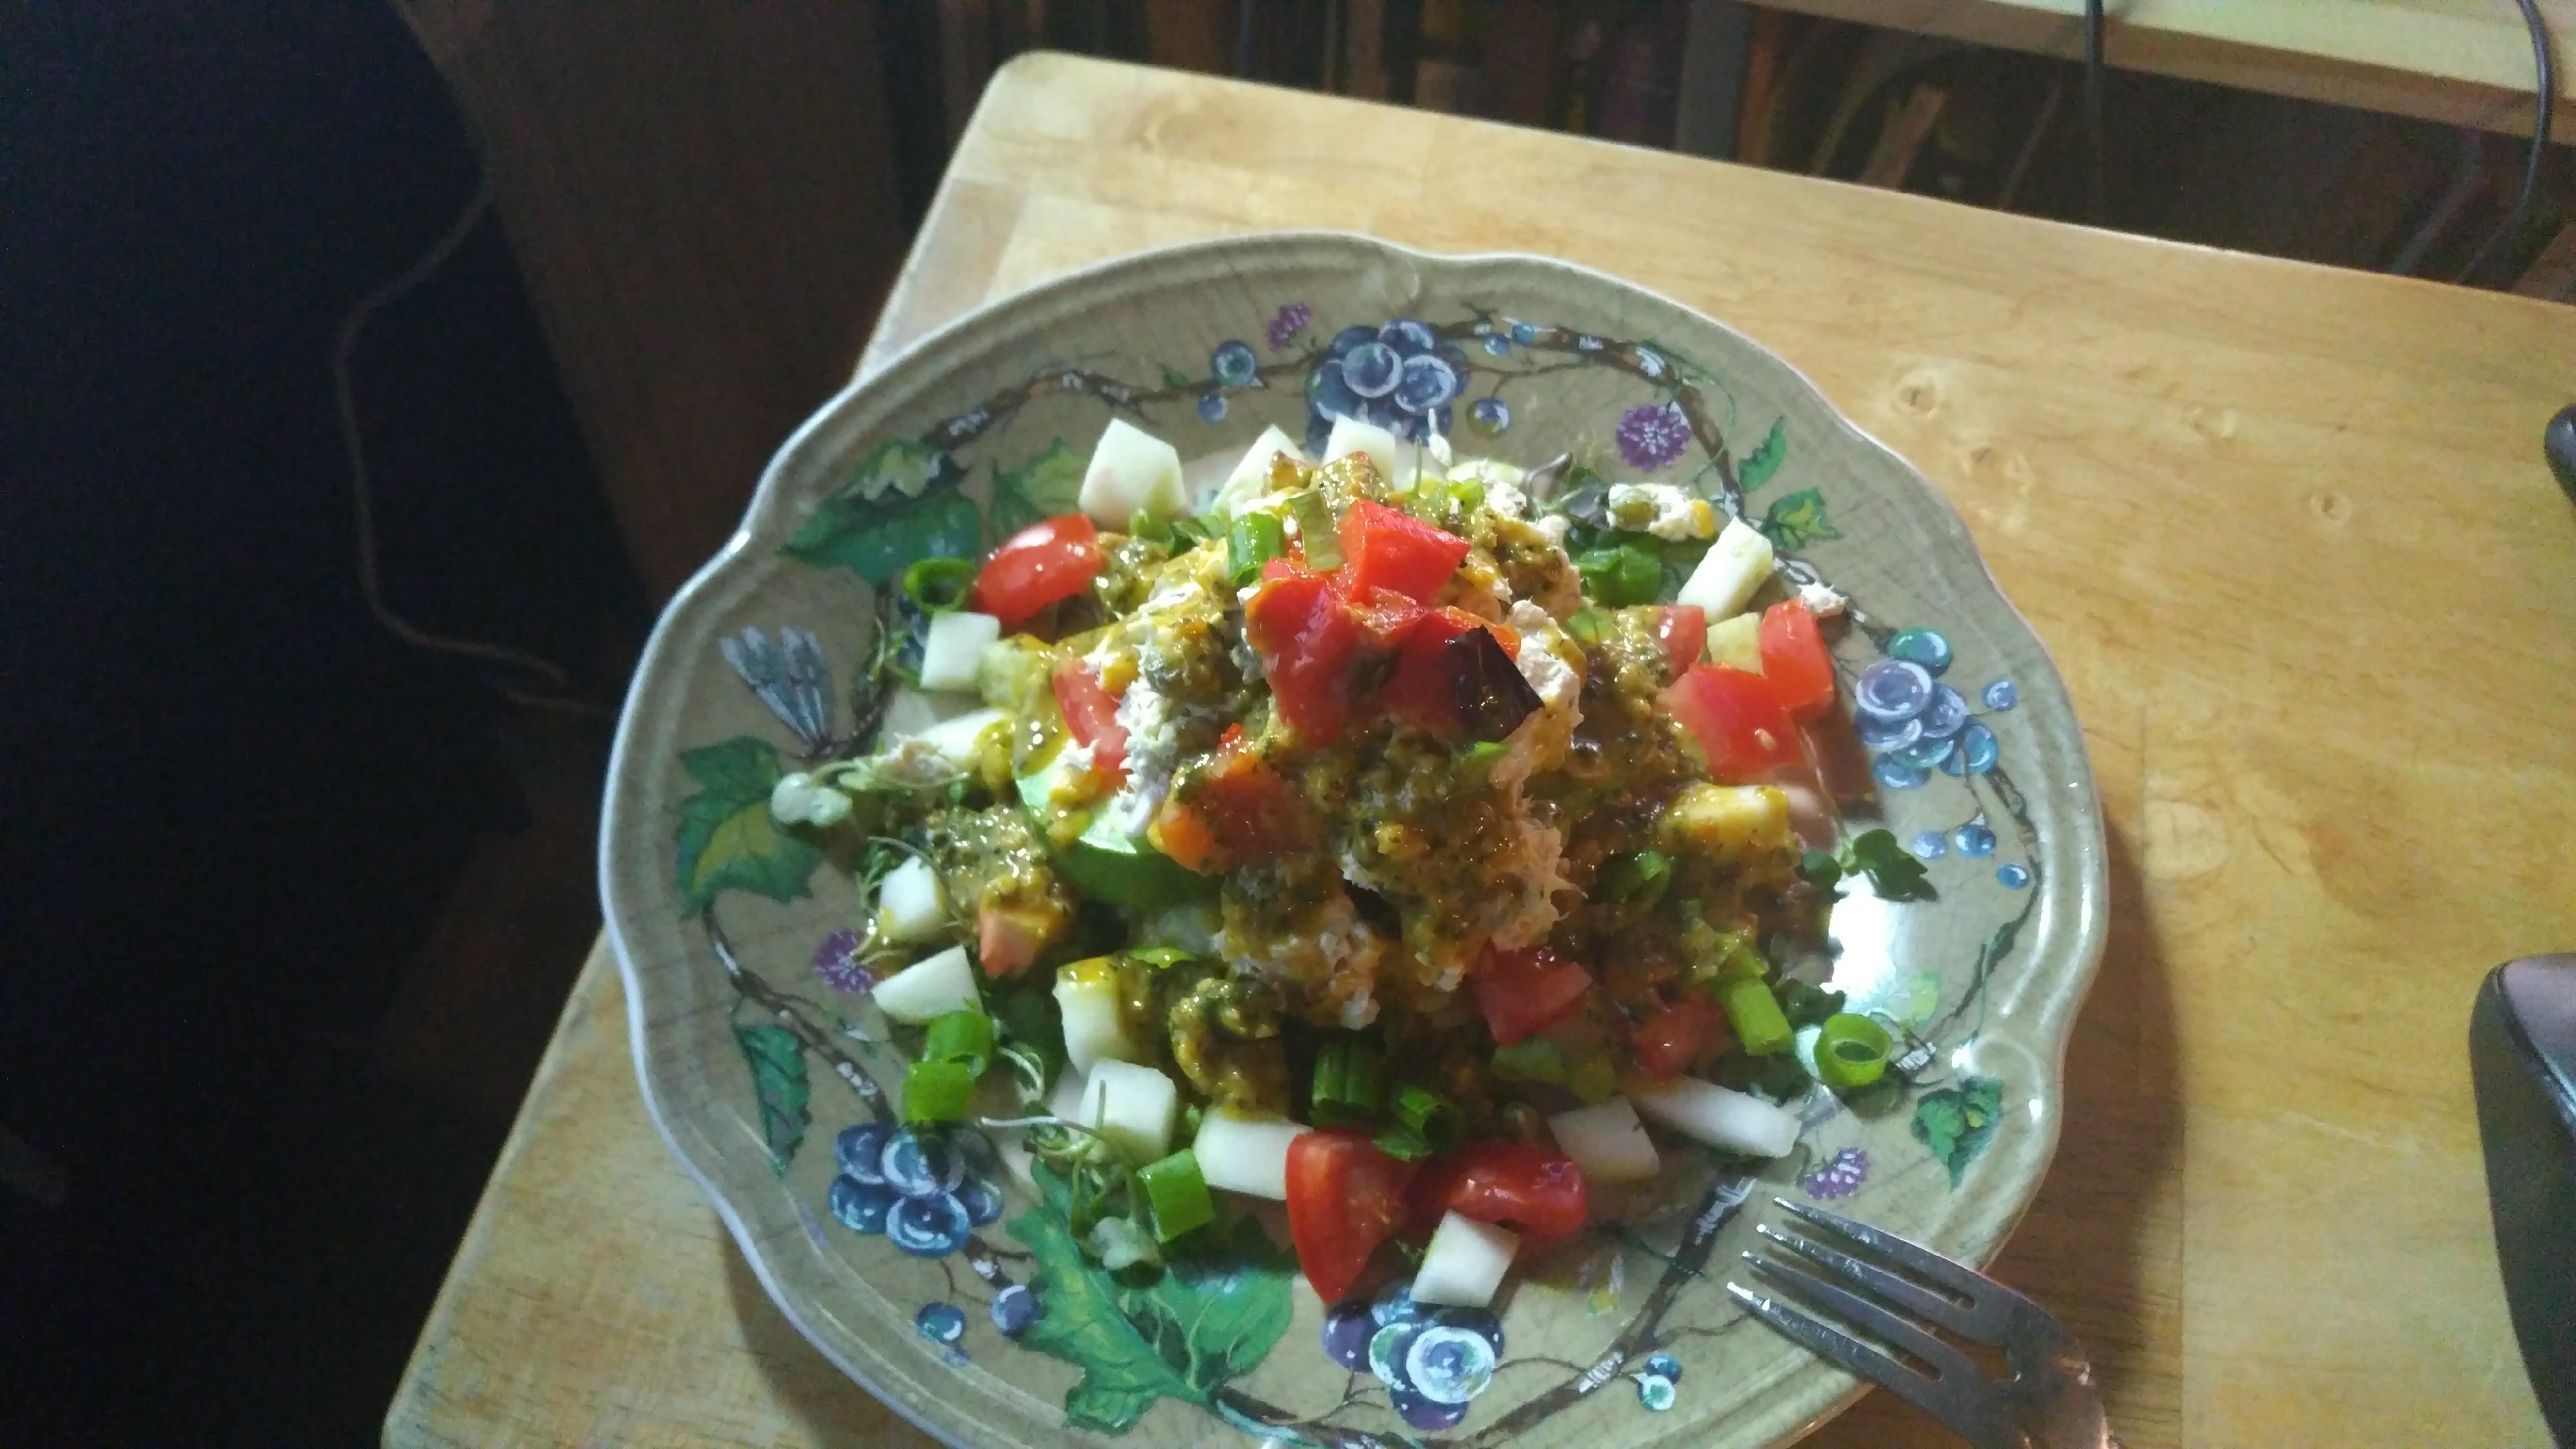 Peruvian Potato-Chicken Salad (Causa Rellena) DaSuperTroop